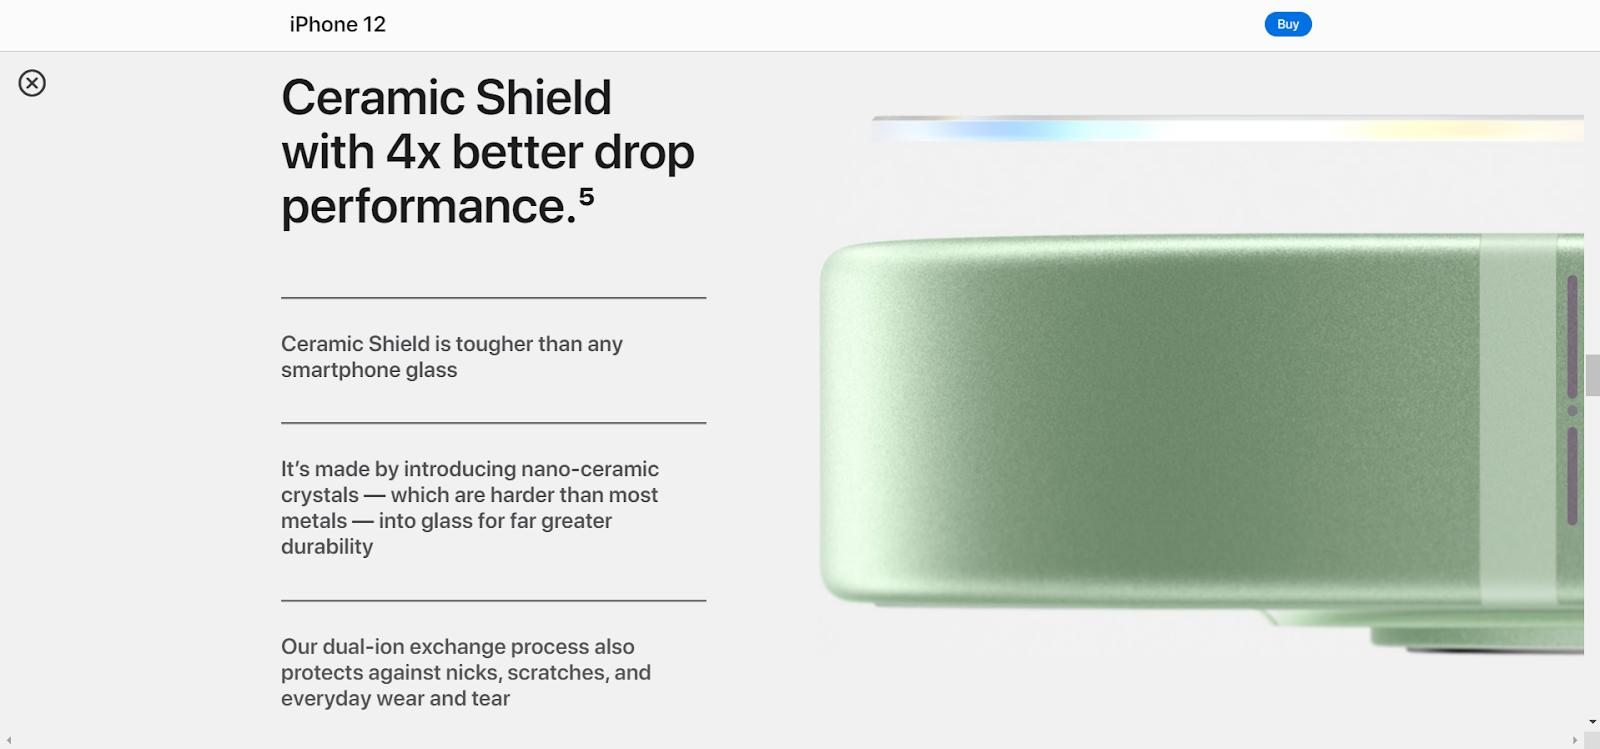 Product description layout for Apple devices